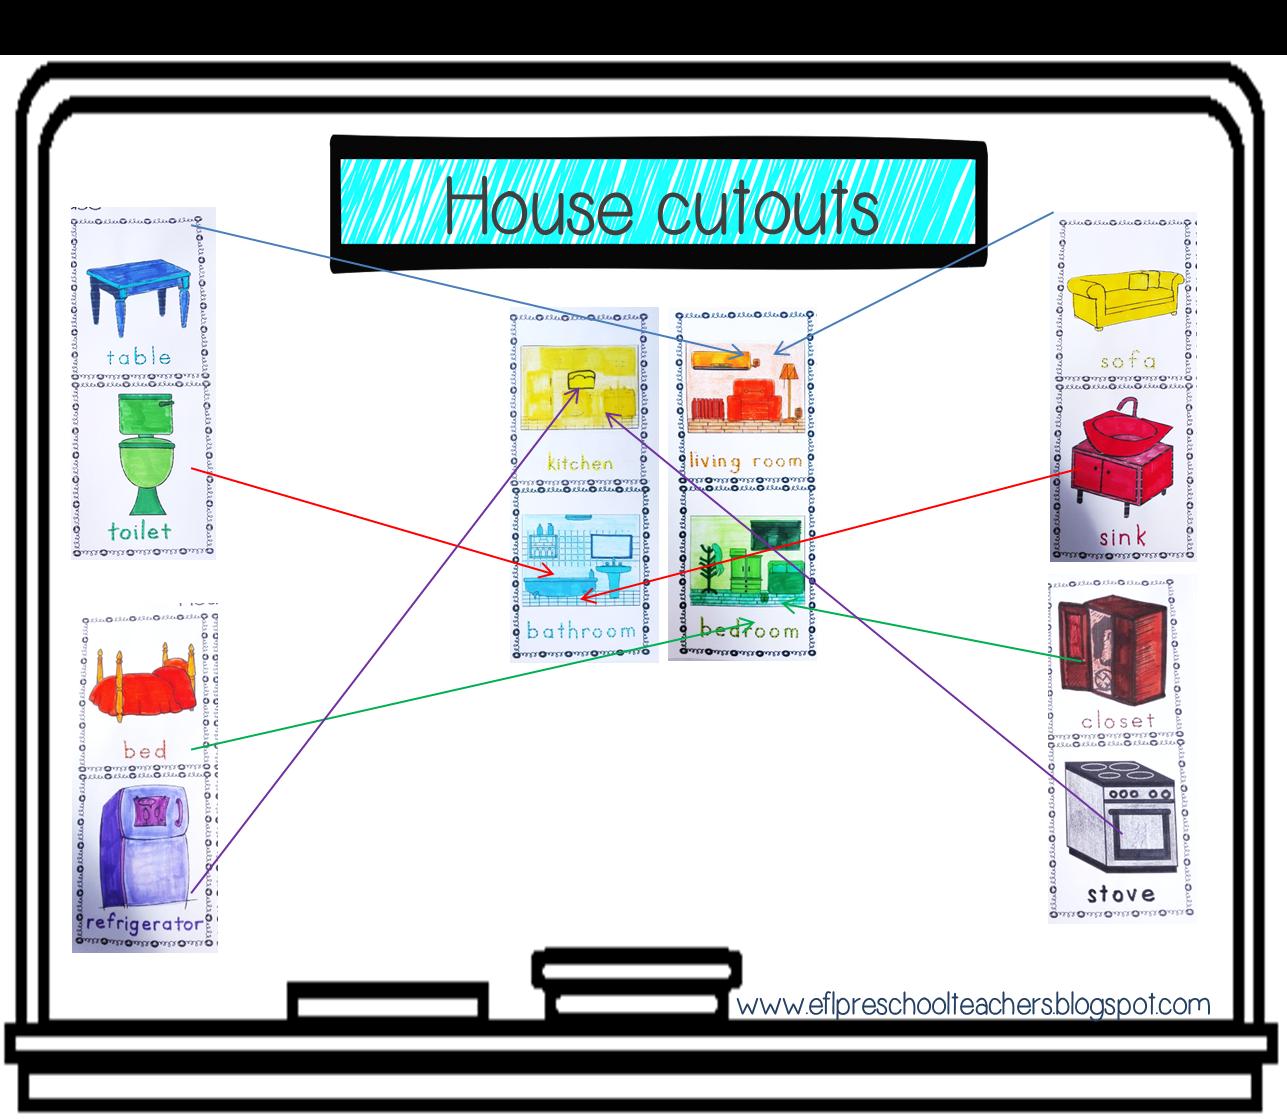 Esl Efl Preschool Teachers House Worksheets For The Preschool Ell